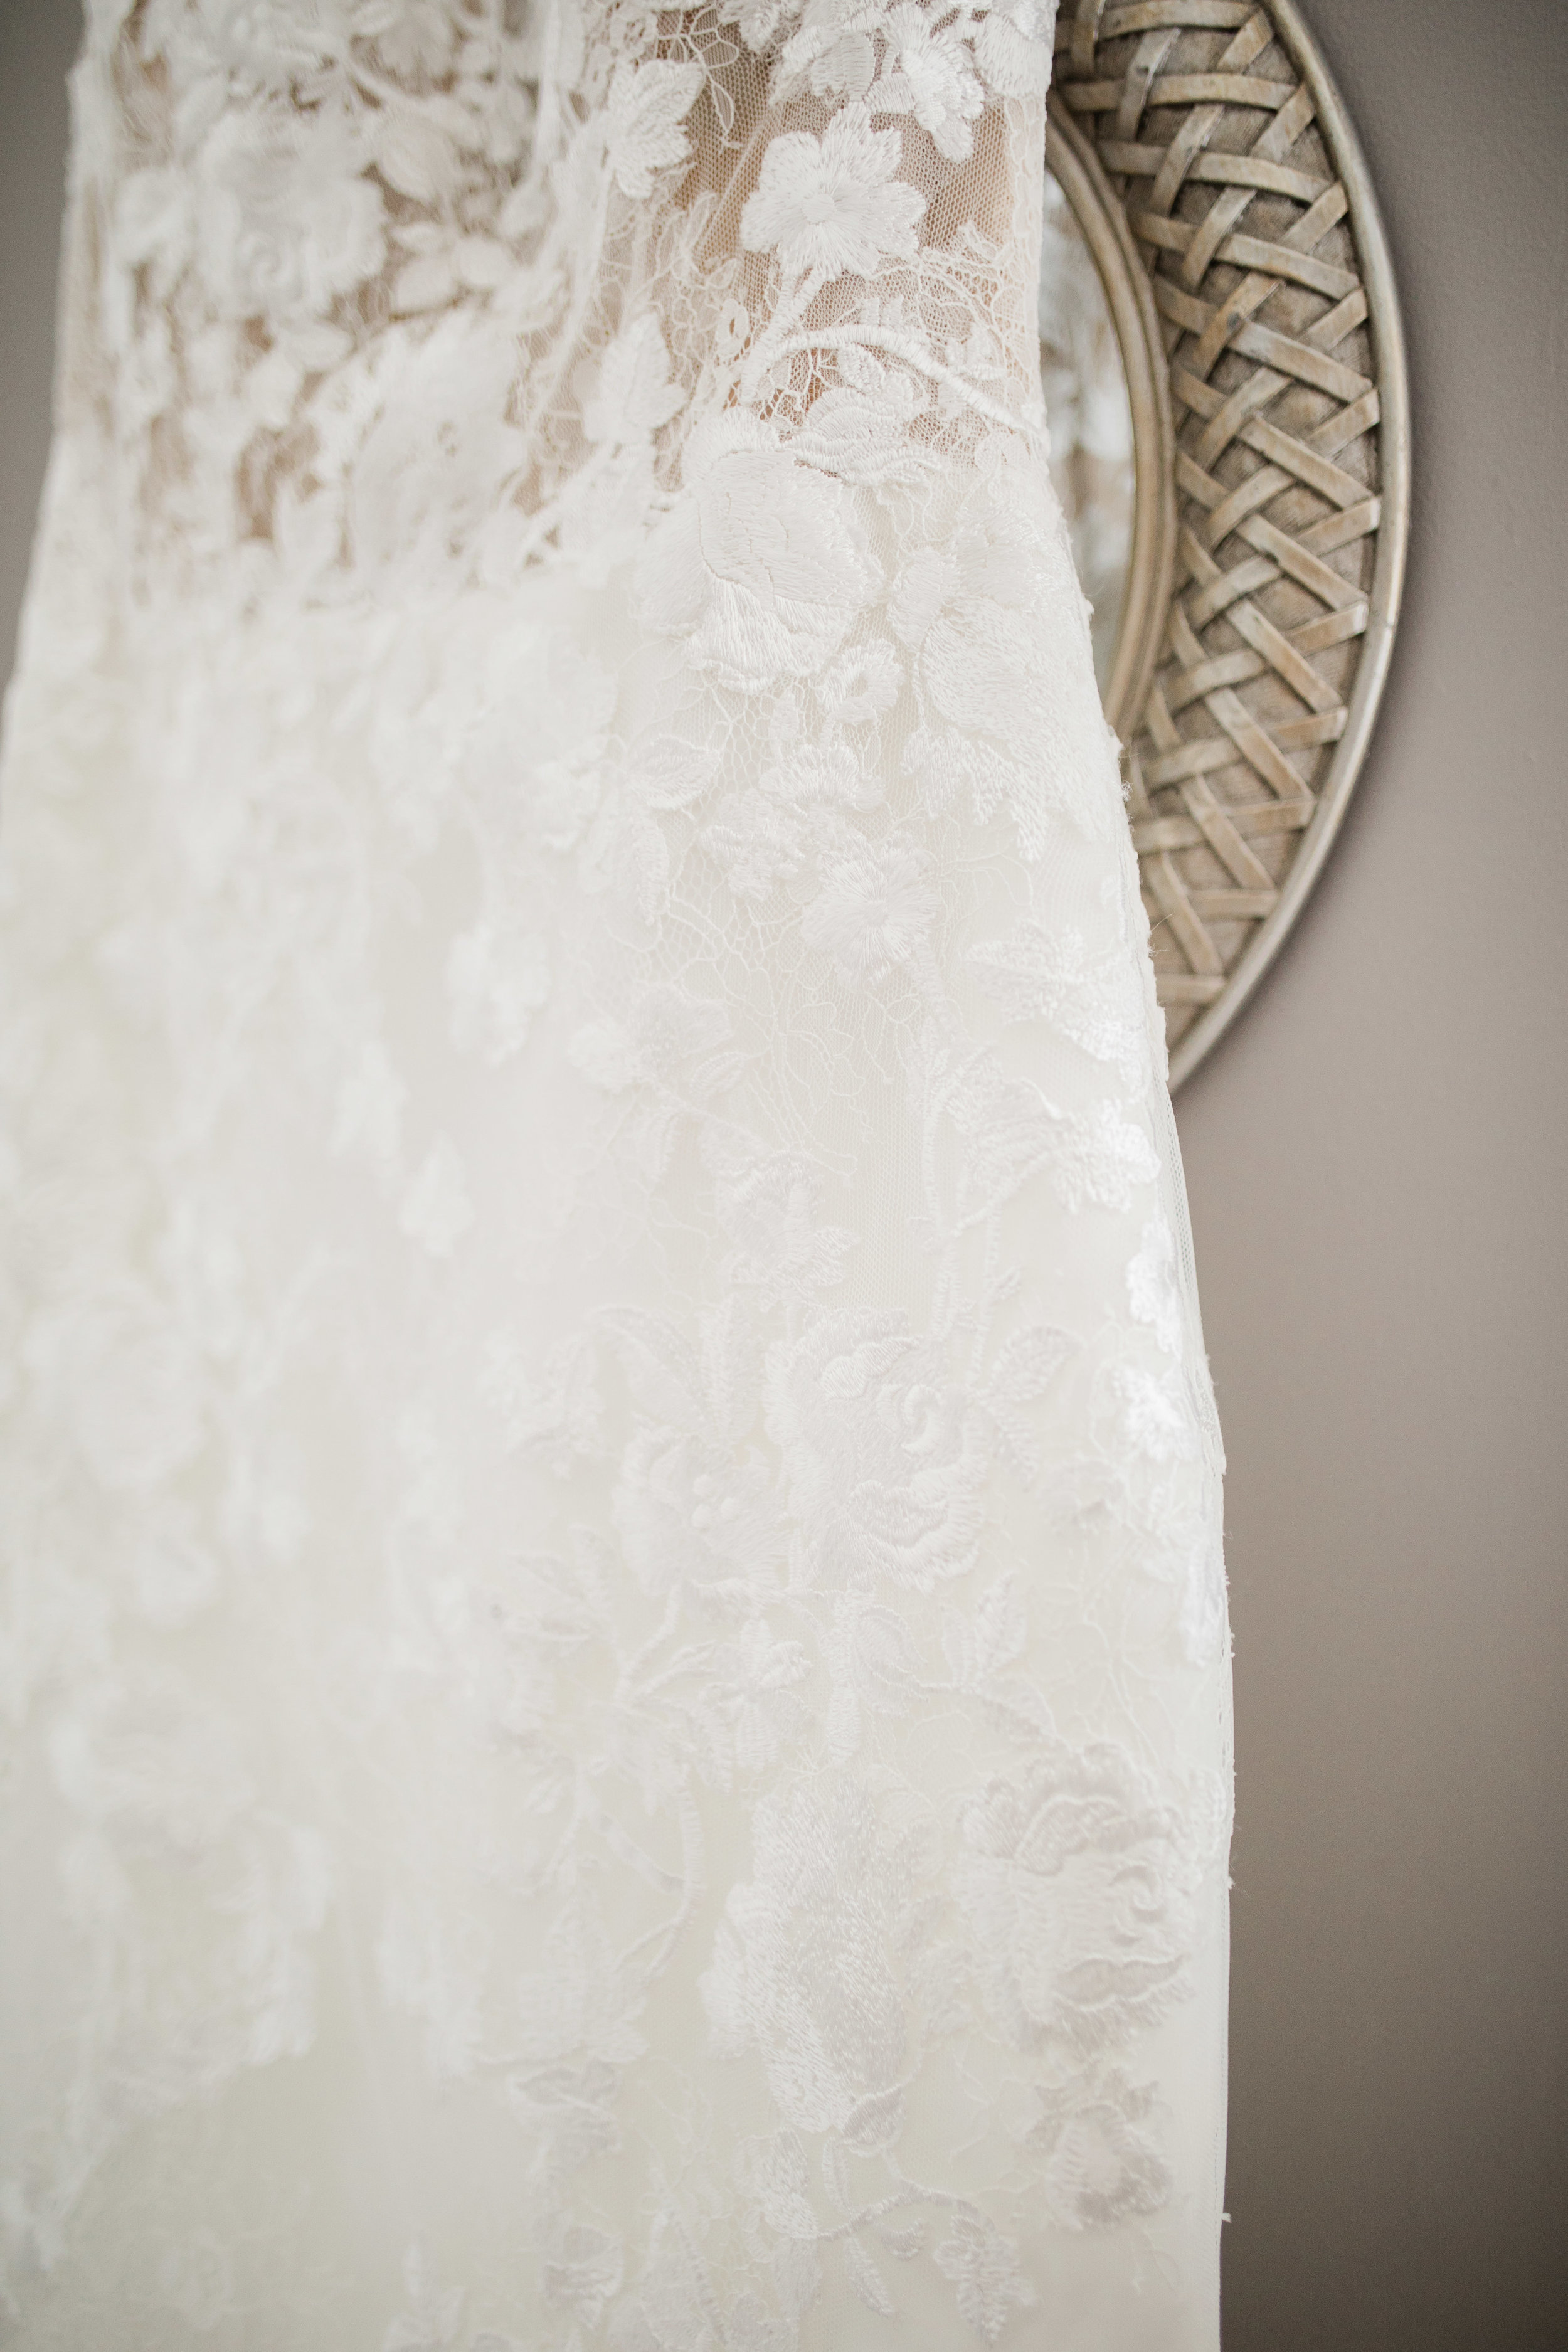 Pronovias Gown Details at Everthine bridal